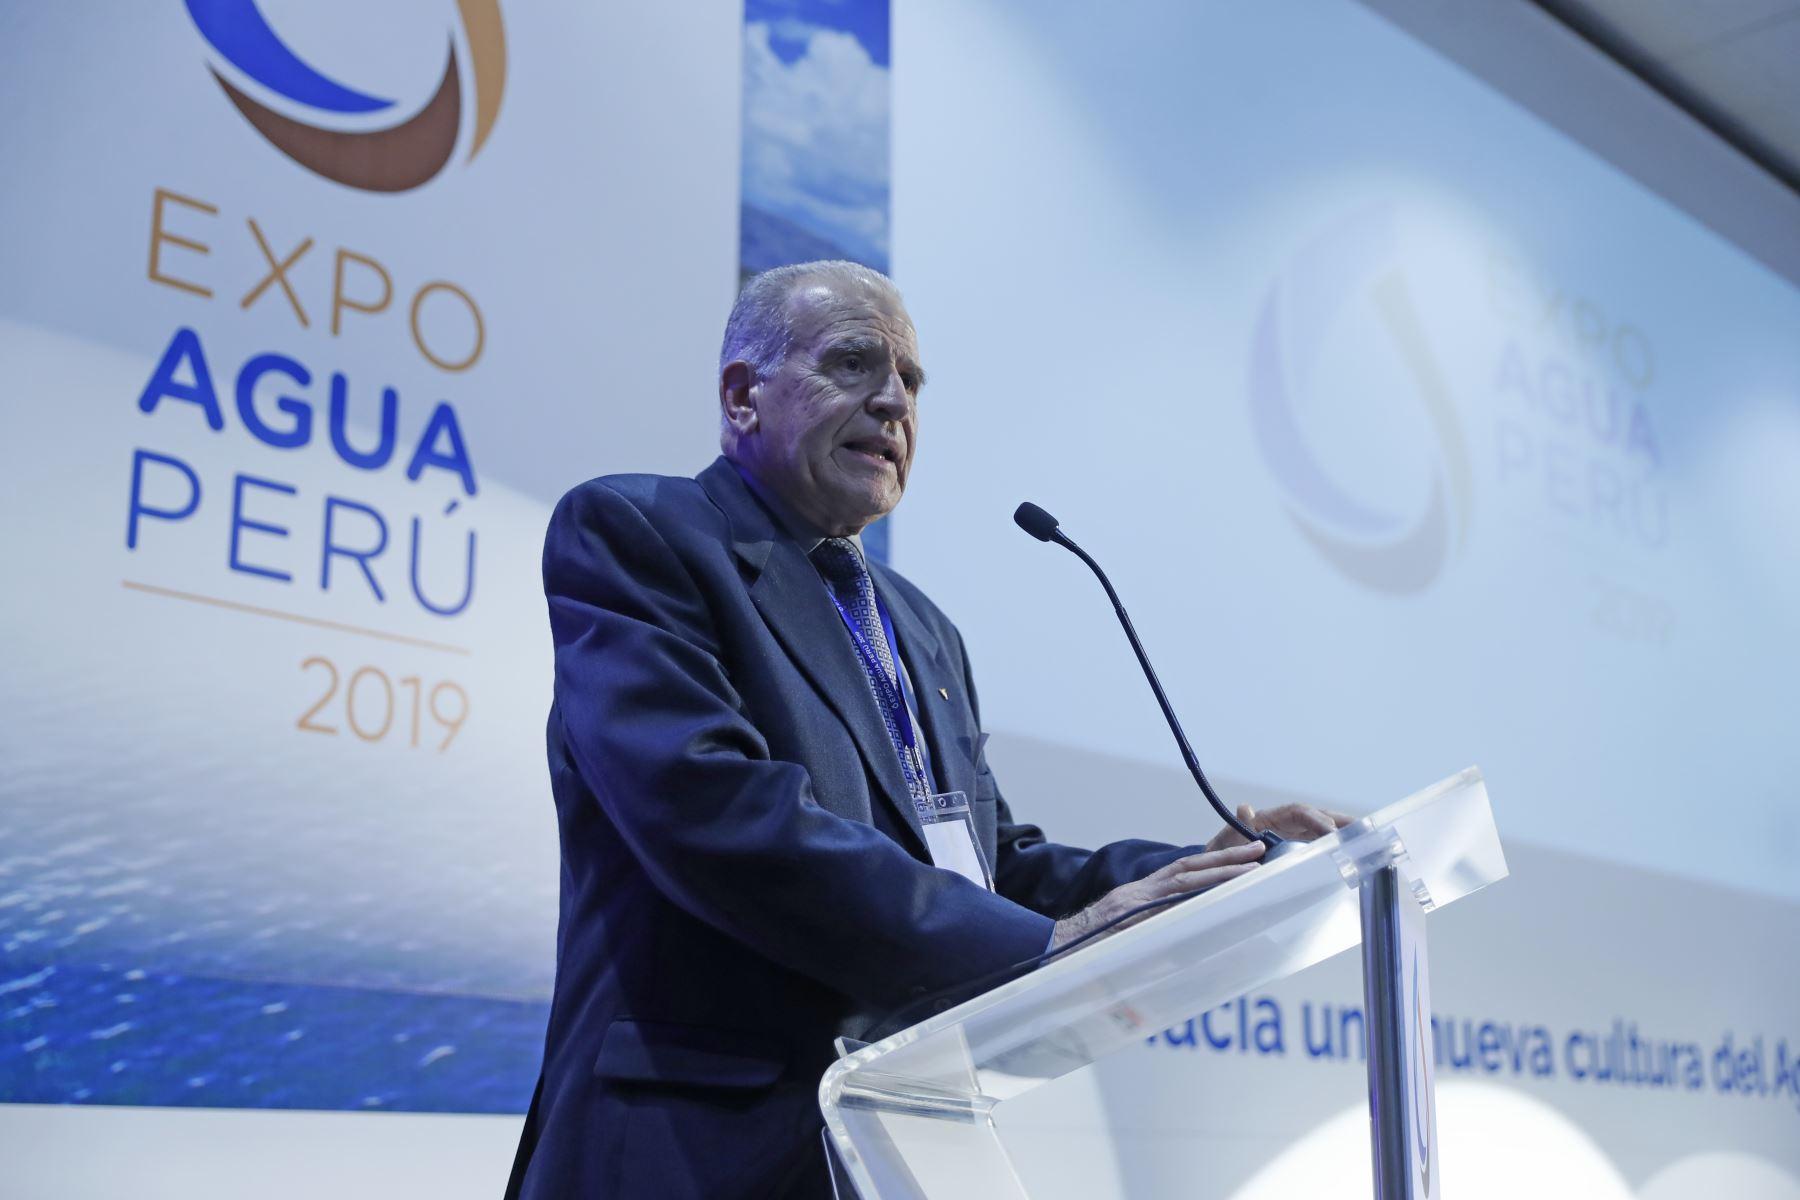 Carlos Silvestri, presidente del Comité Organizador de Expo Agua Perú expone durante clausura. Foto: ANDINA/Renato Pajuelo